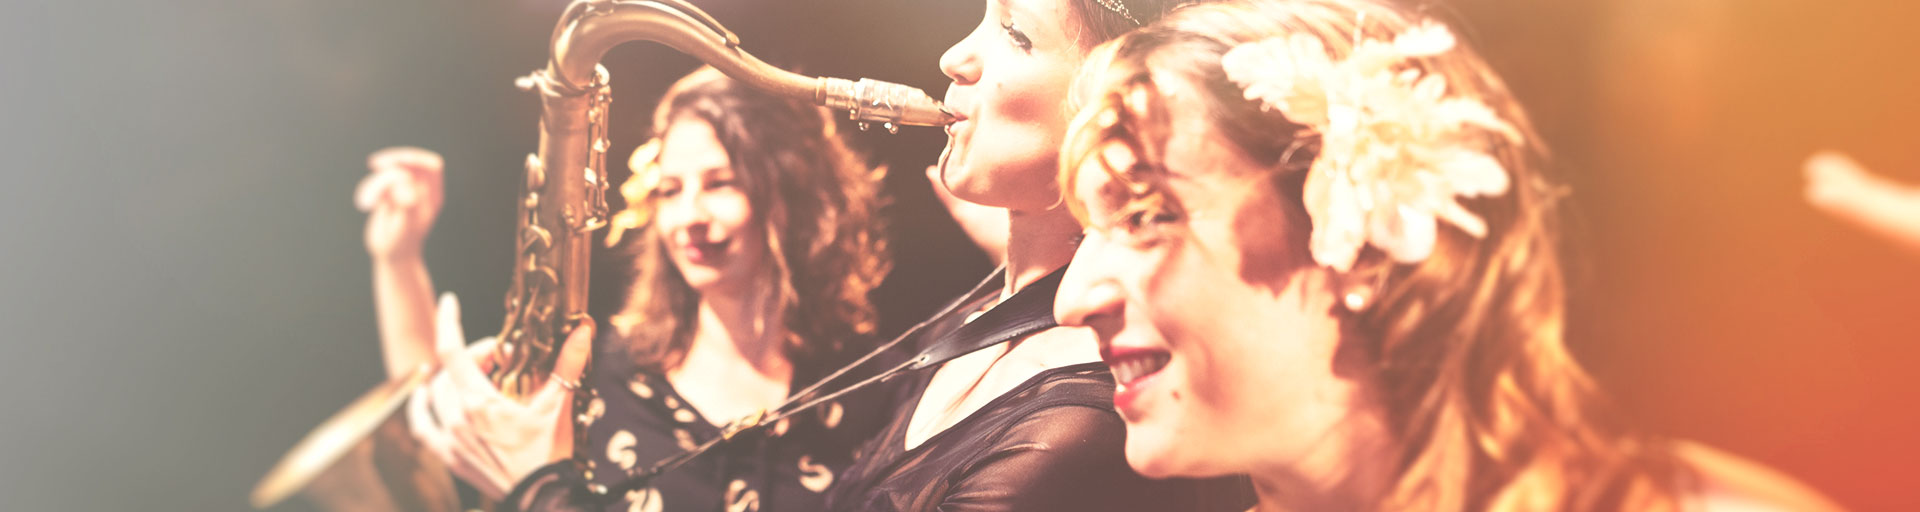 Music Venue Stage Two Bristol Virginia